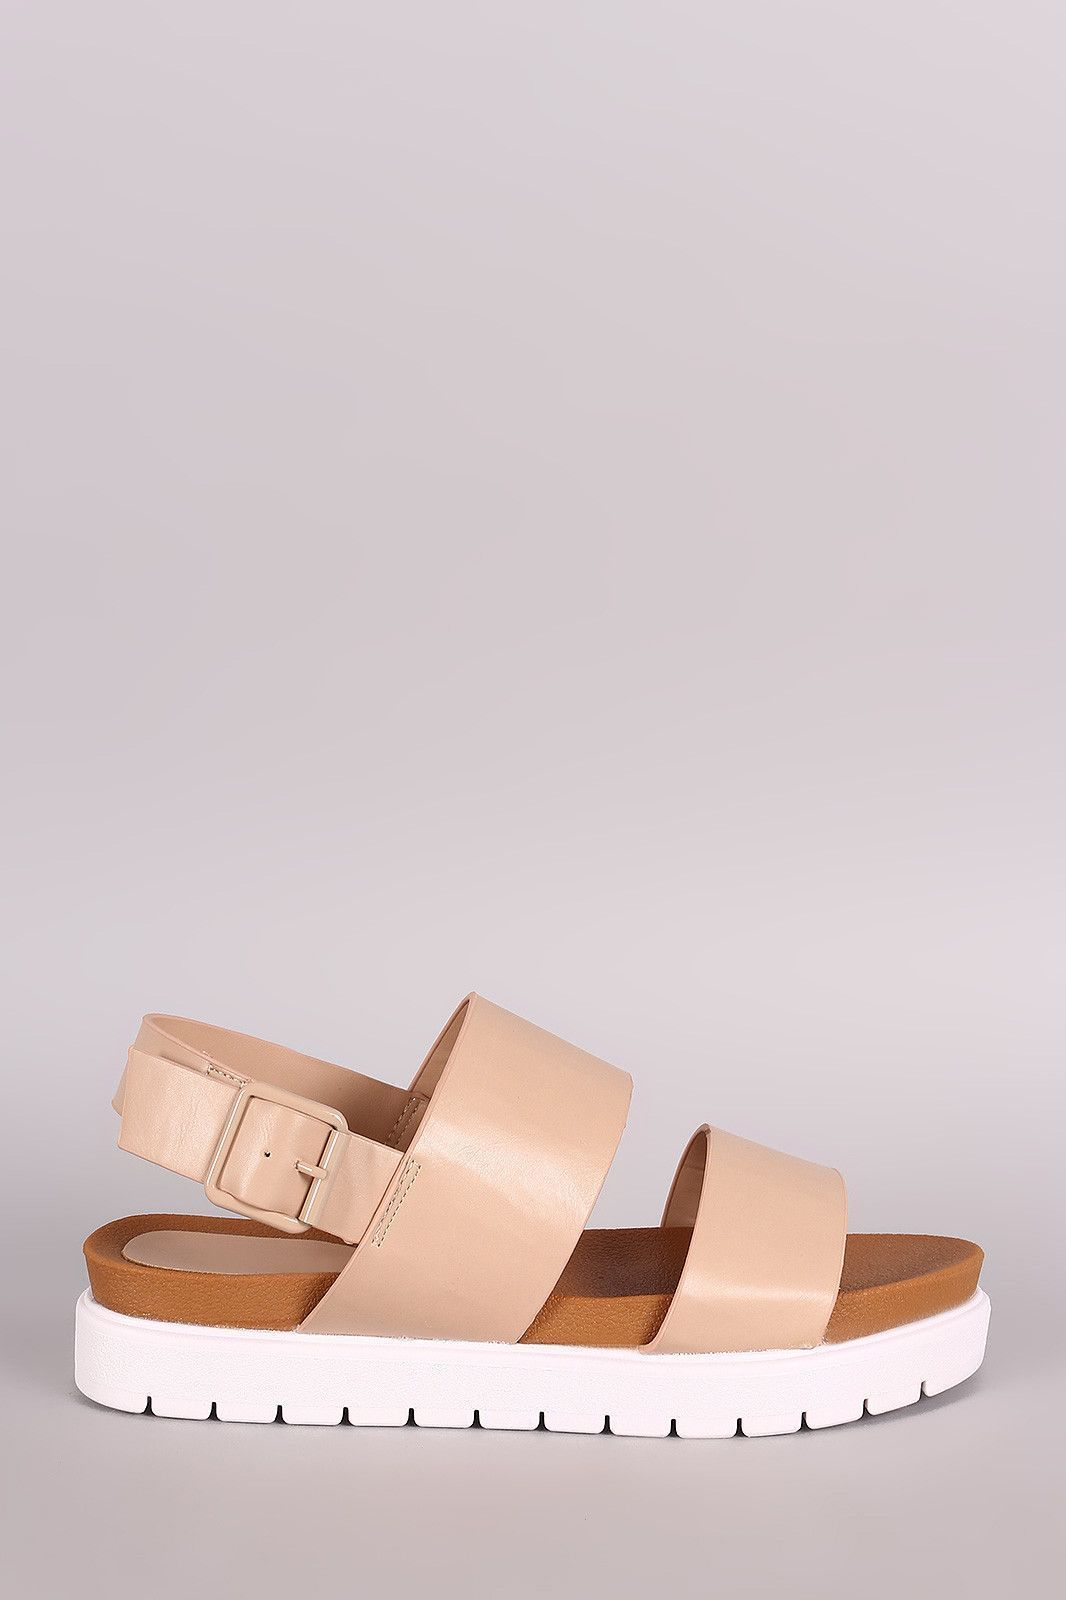 7da6ace21 Bamboo Vegan Leather Two Band Lug Sole Flatform Sandal